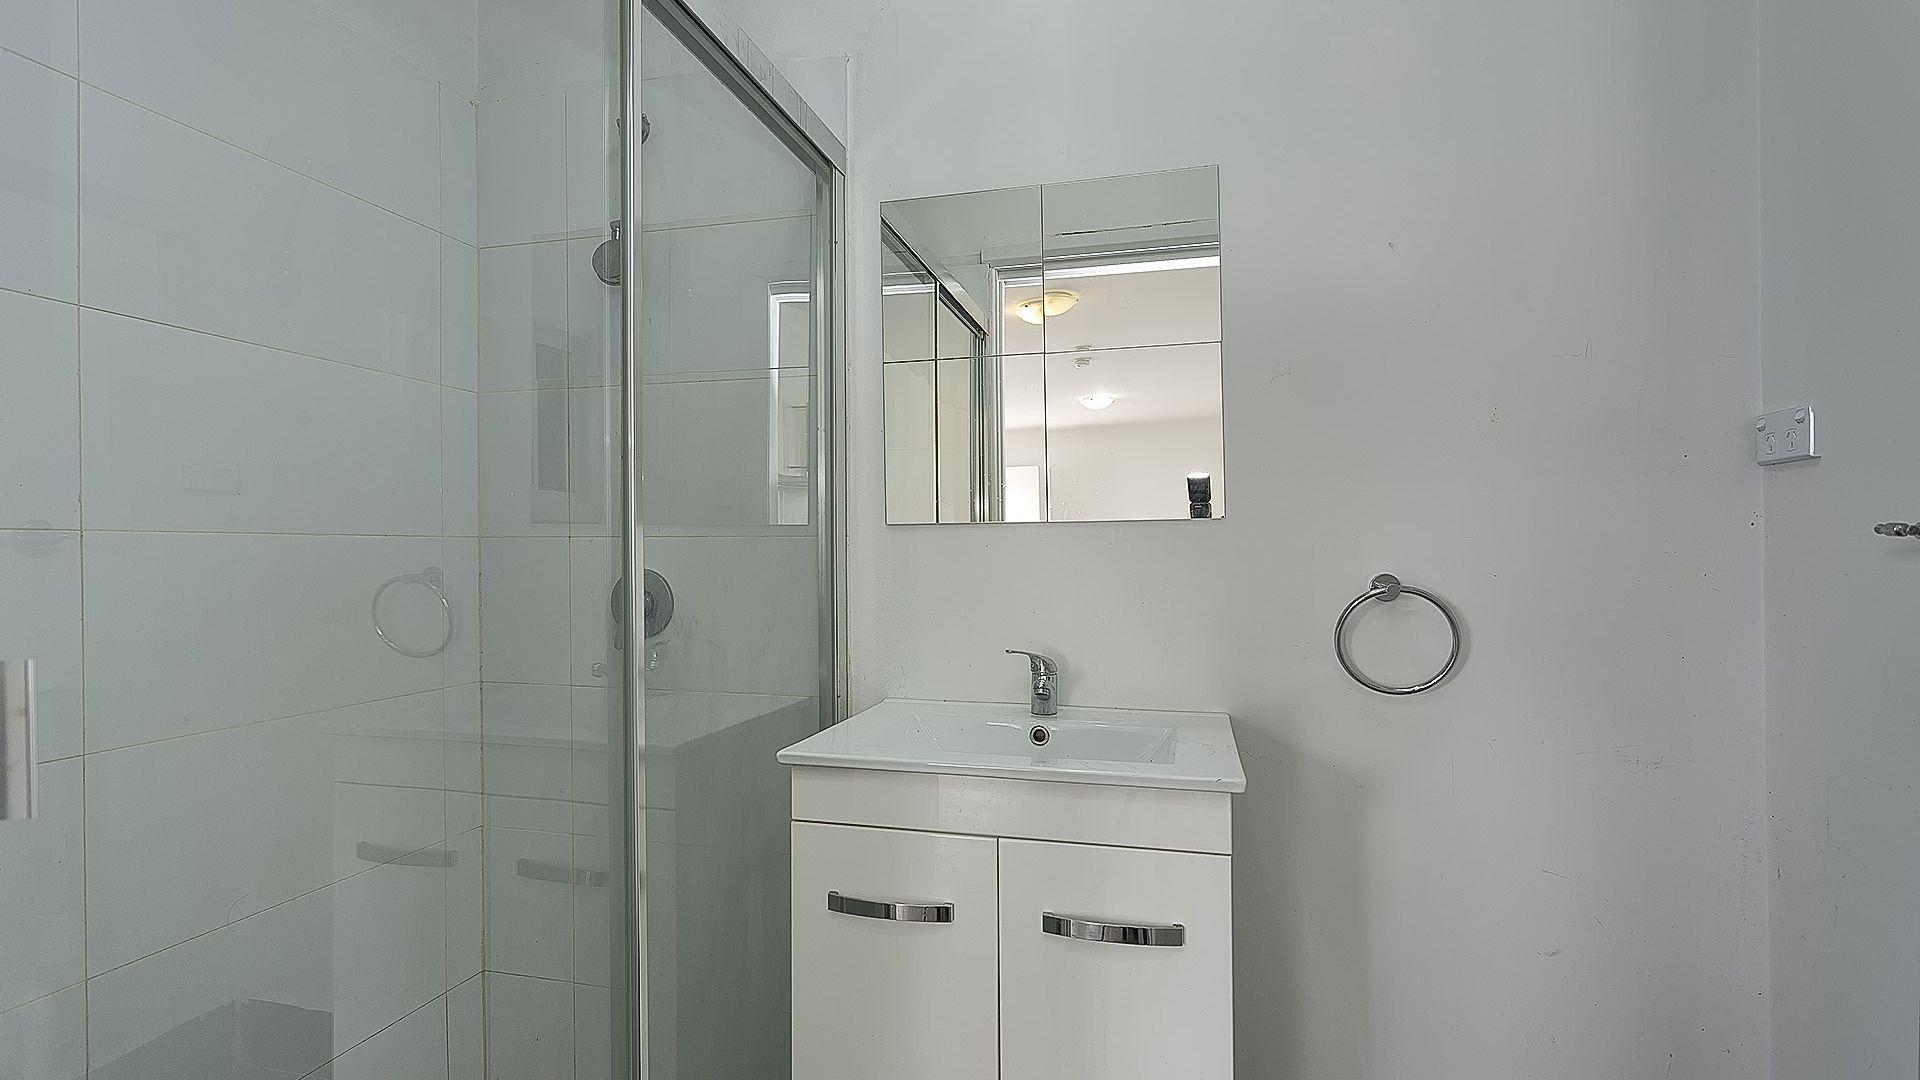 a/80 parramatta, Homebush NSW 2140, Image 2